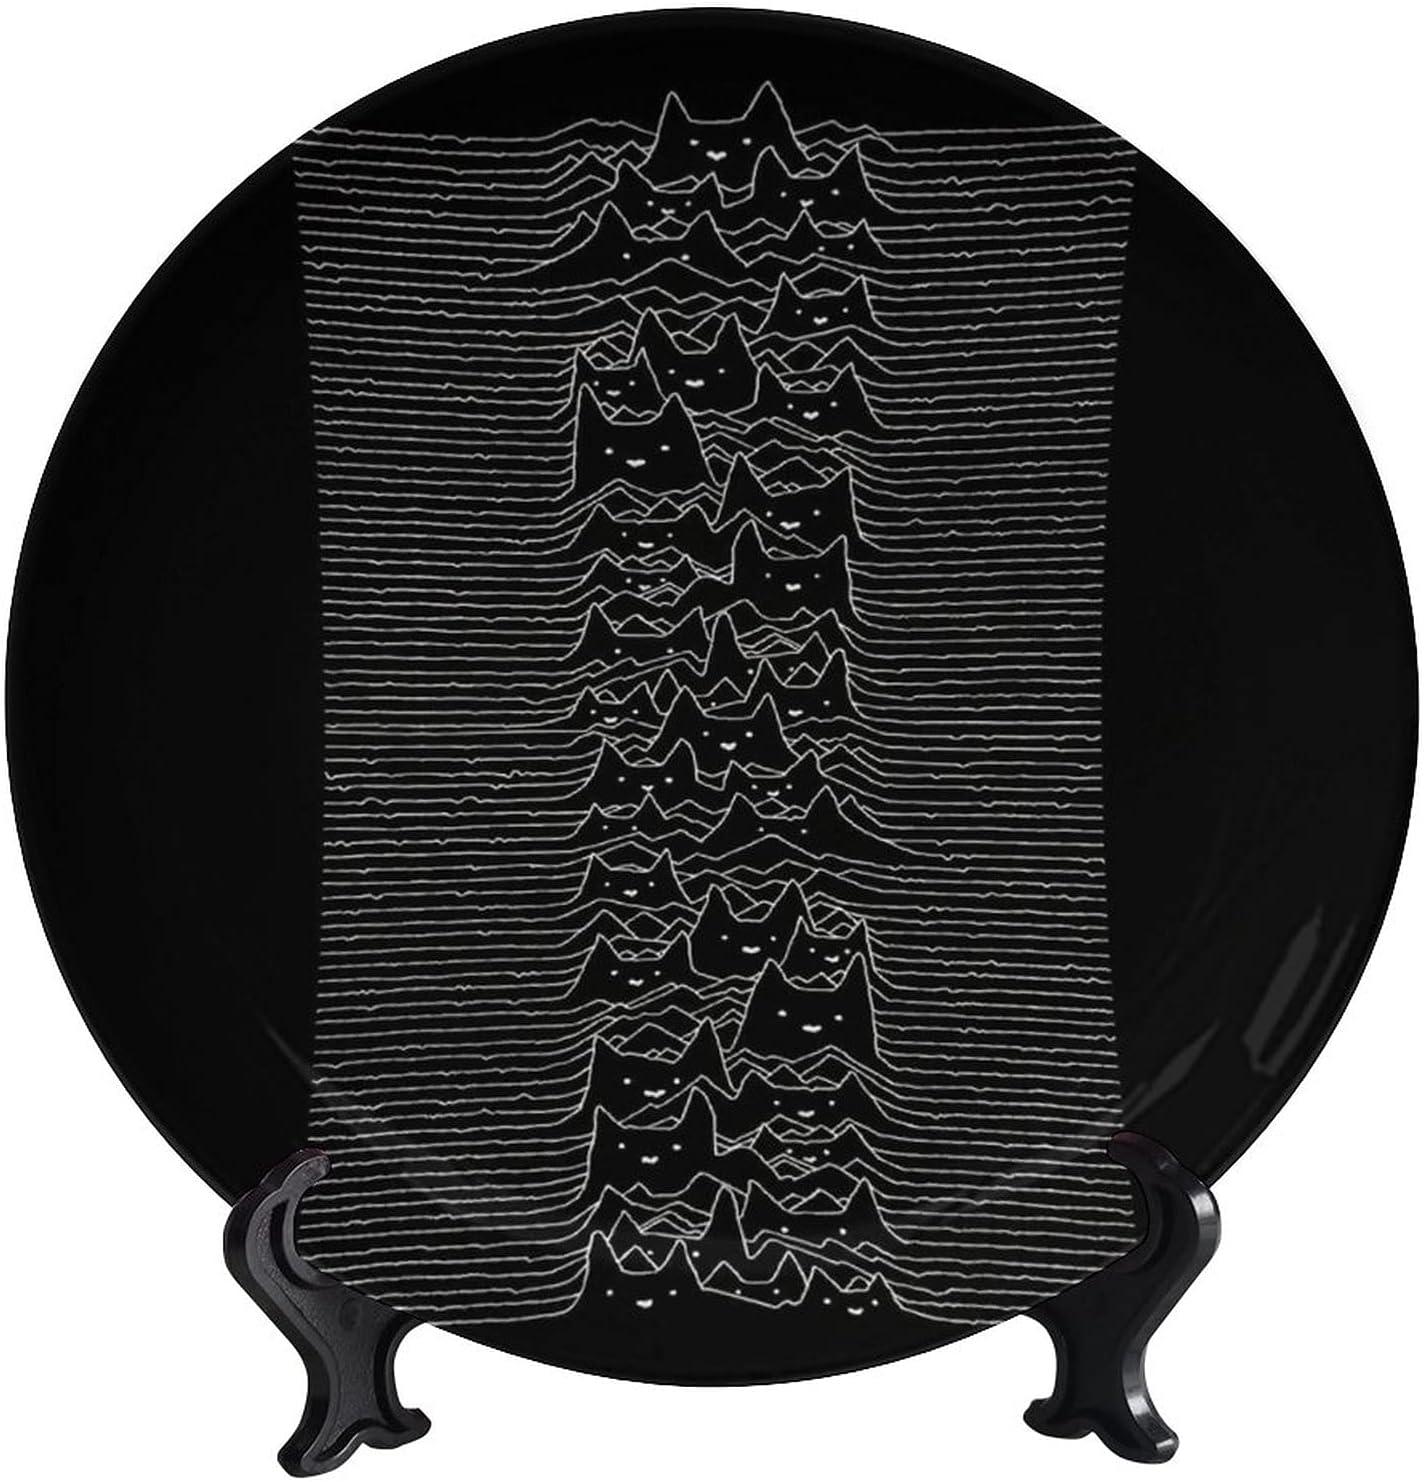 wonderr shopping Furr Division Decorative Plates De It is very popular Funny Art Animal